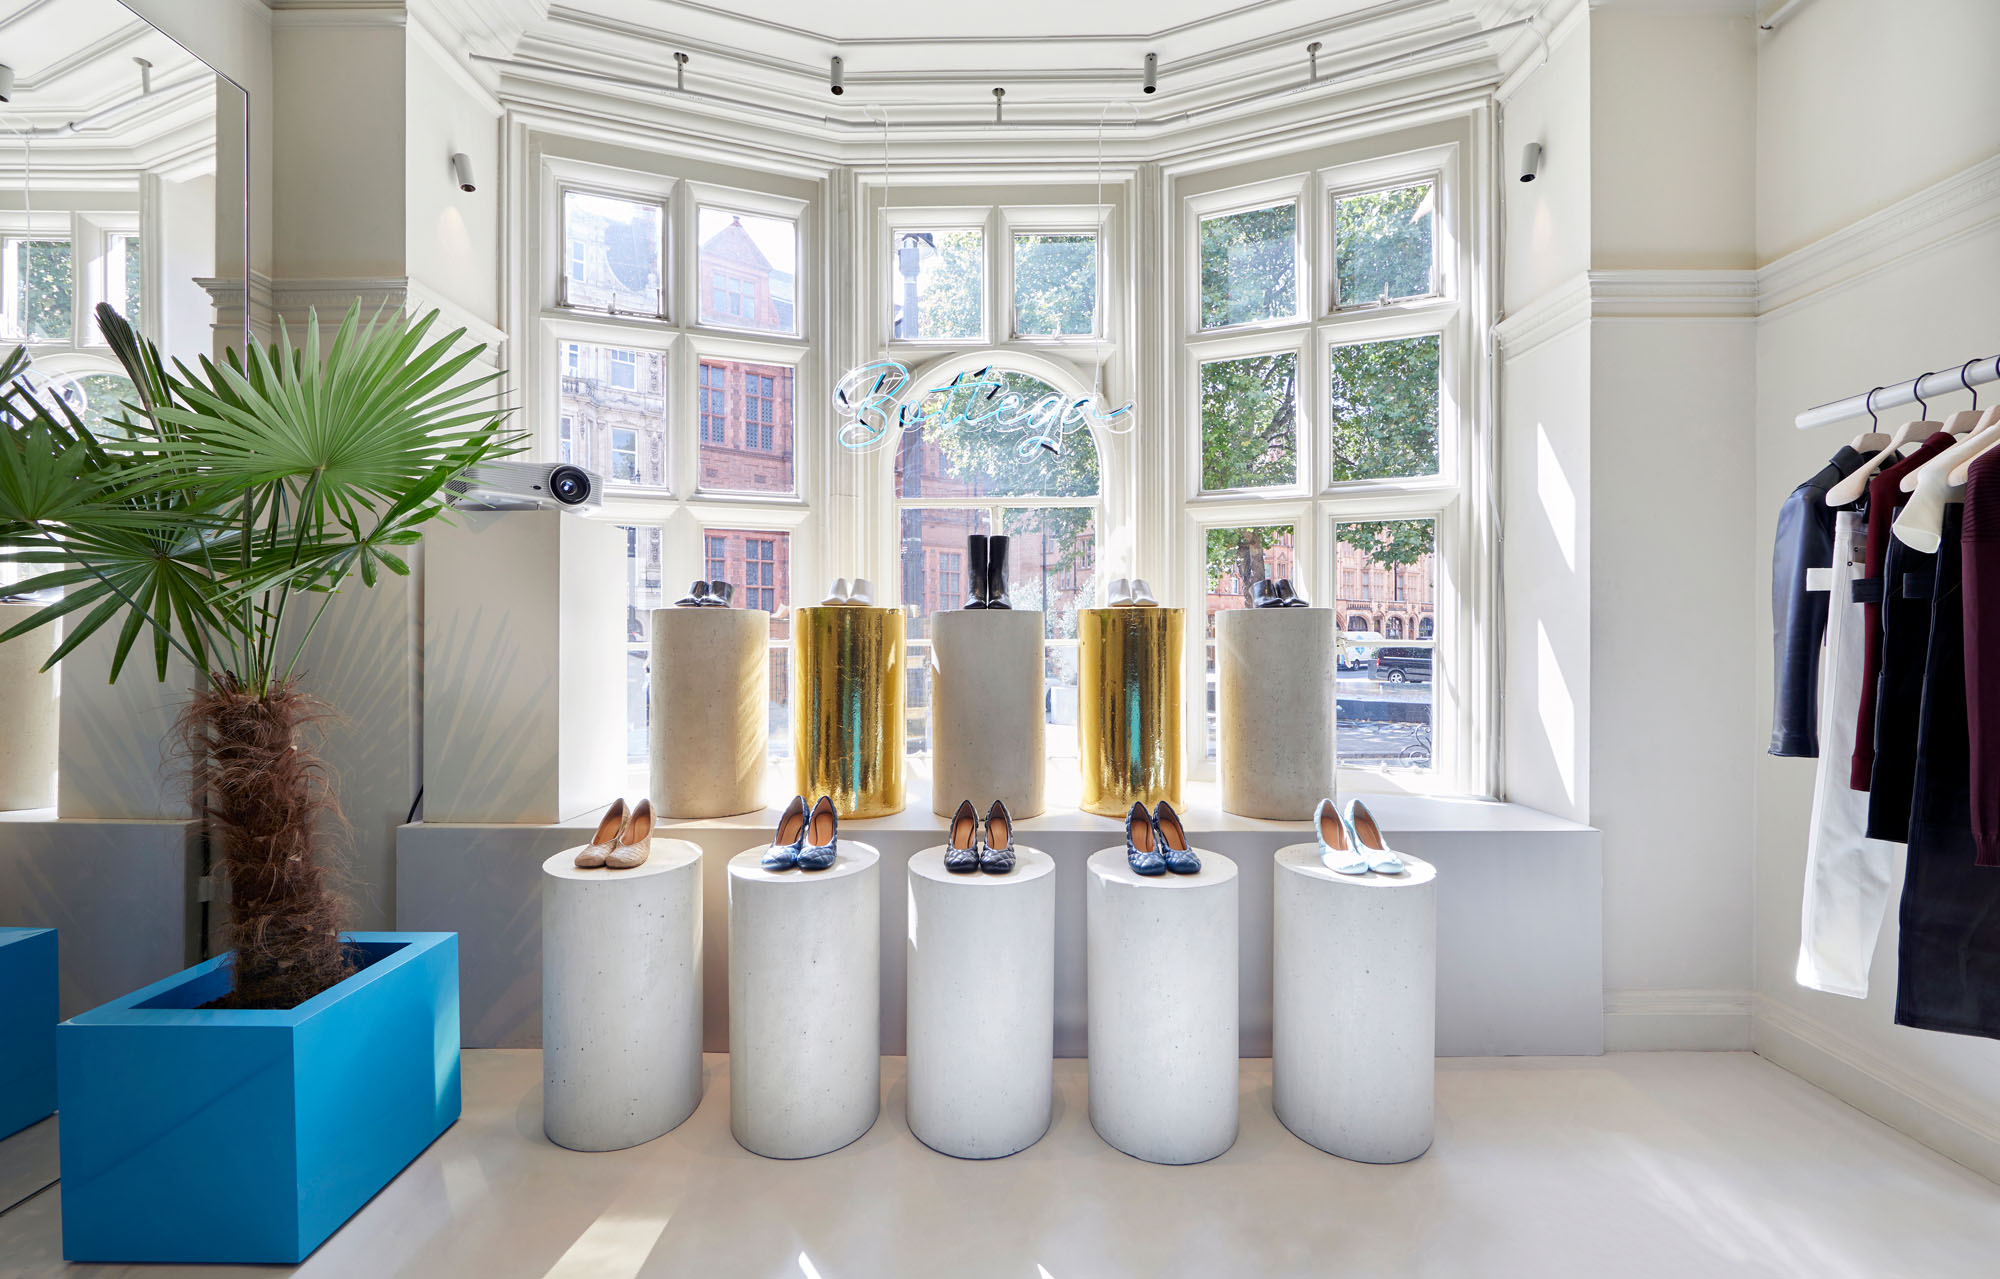 L'installation Bottega Veneta au 5 Carlos Place à Londres